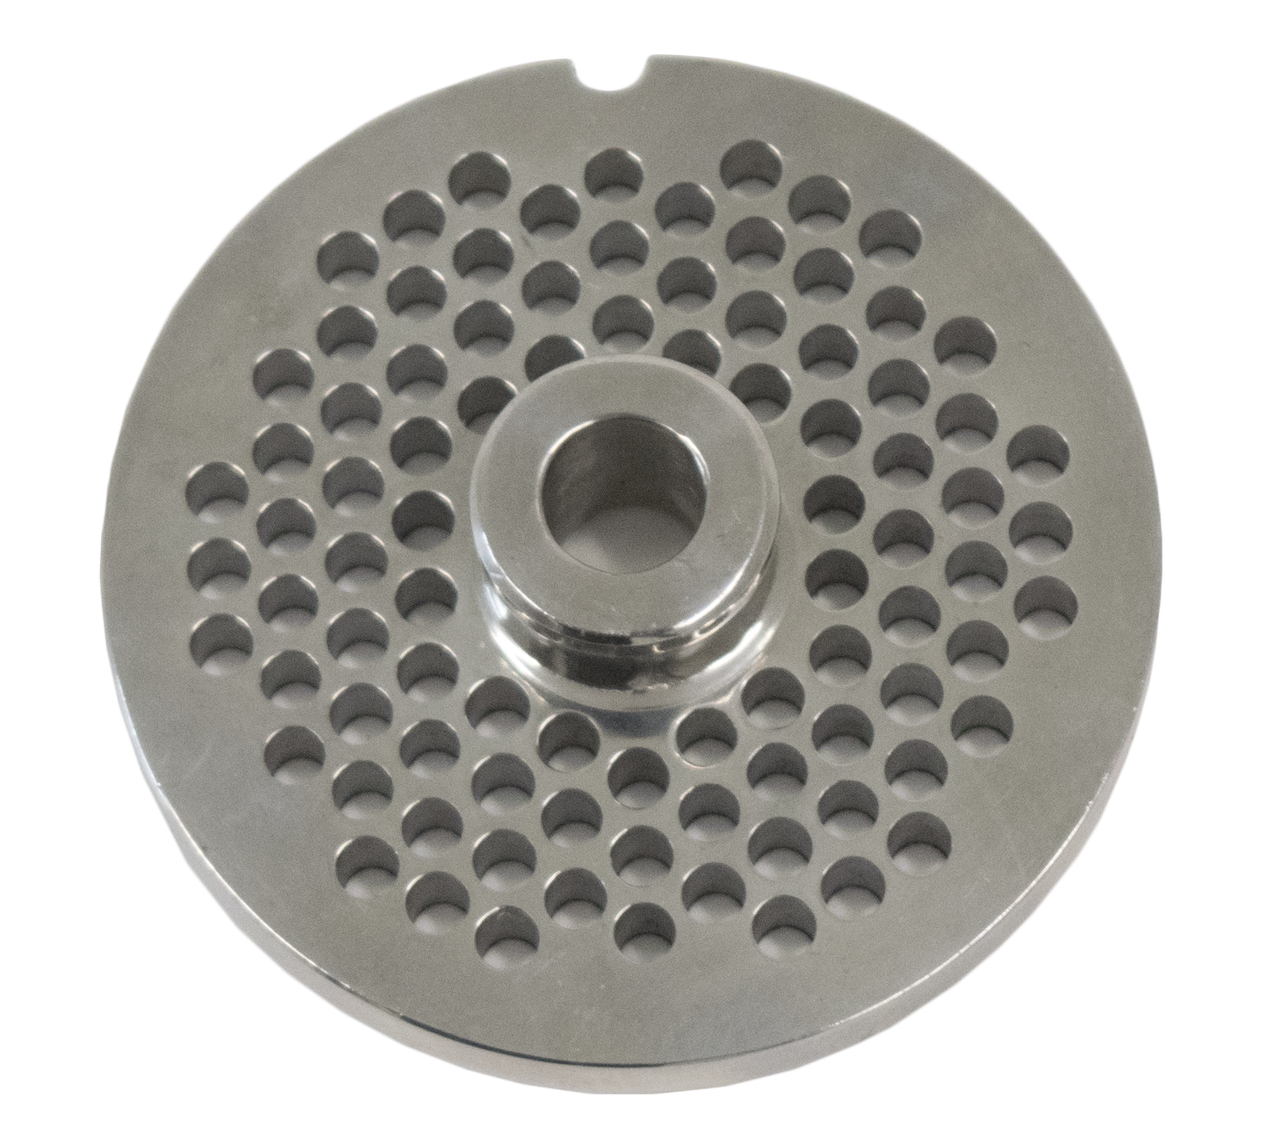 American Eagle Food Machinery #12 Meat Grinder Plate, 4mm, 5/32 inch, AE-G12N/08-04